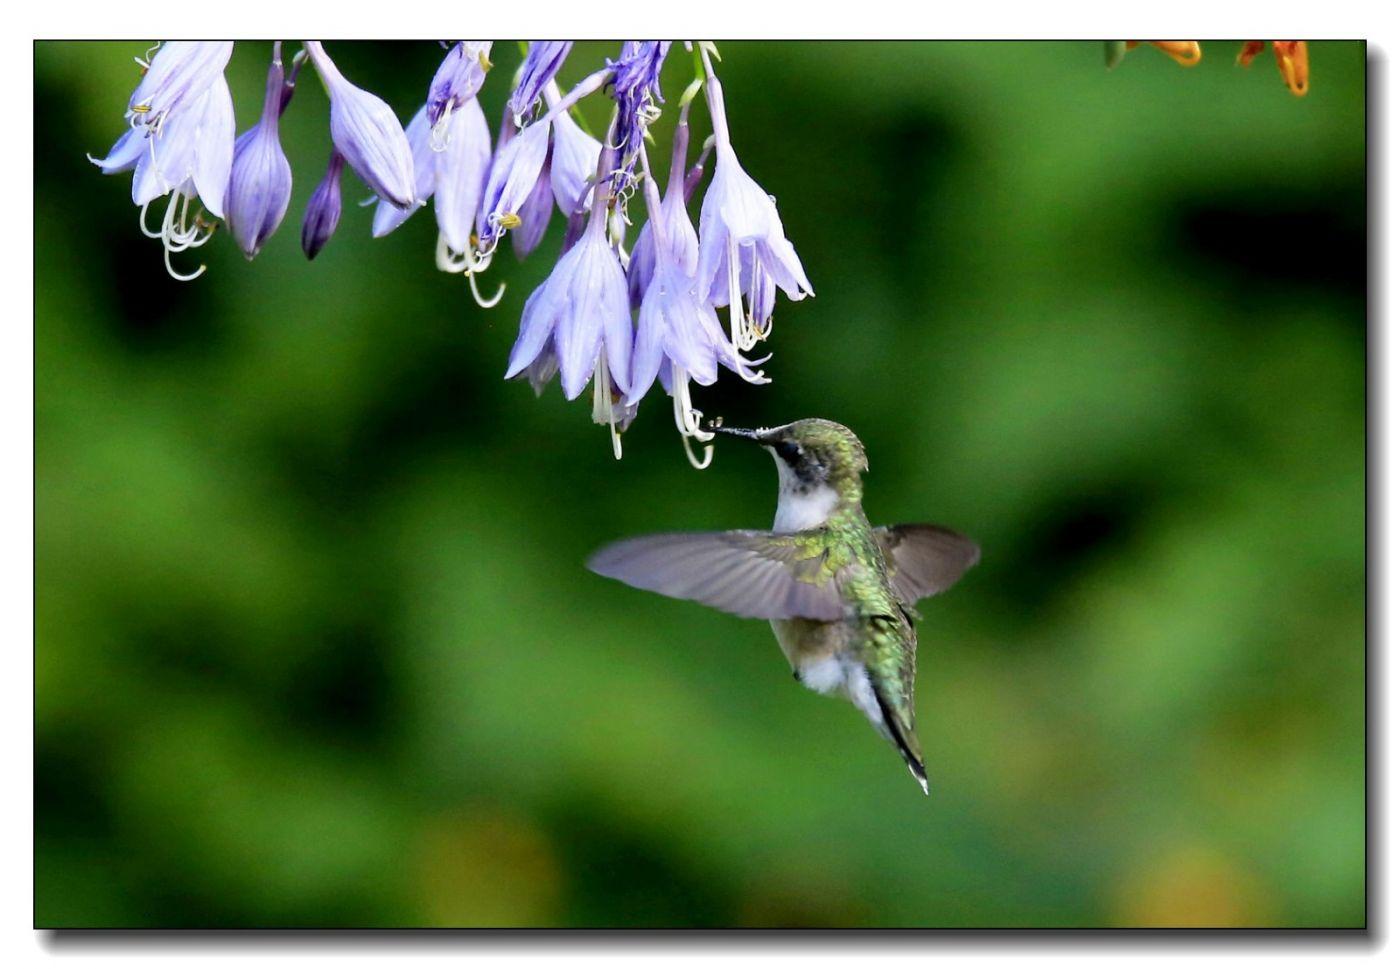 蜂鸟组图(六)_图1-2